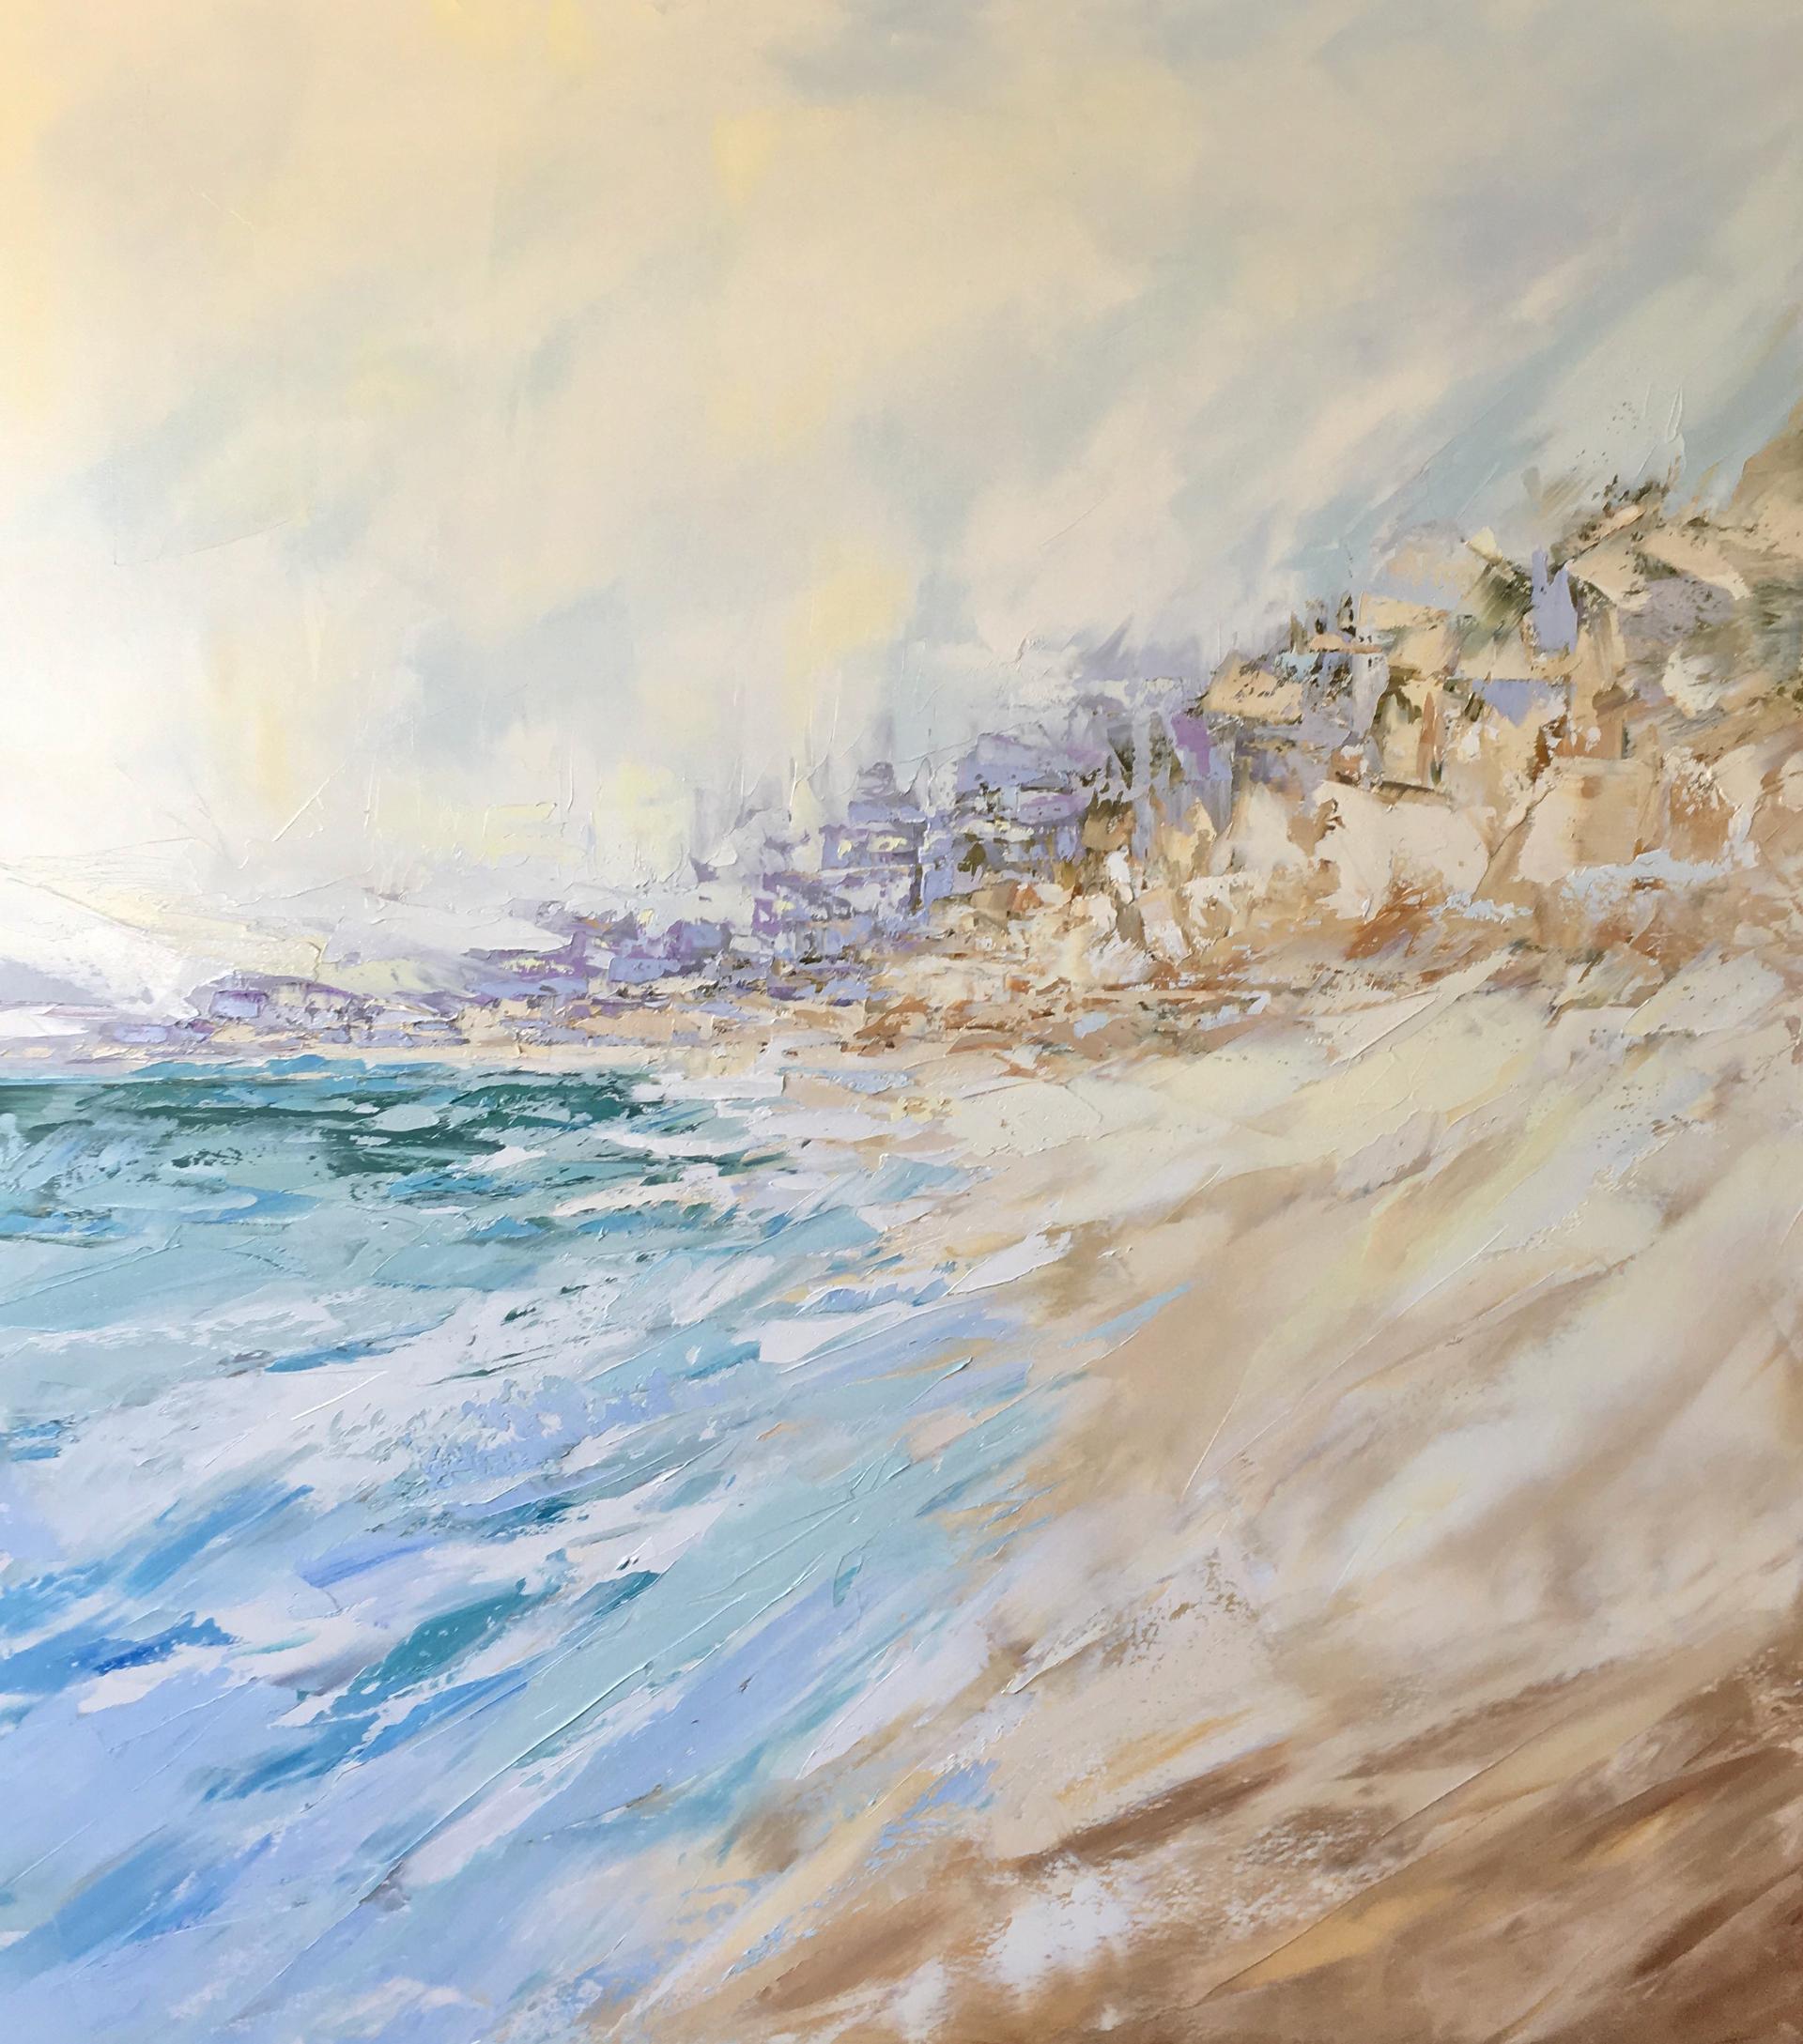 Sand and Water by Sandra Pratt